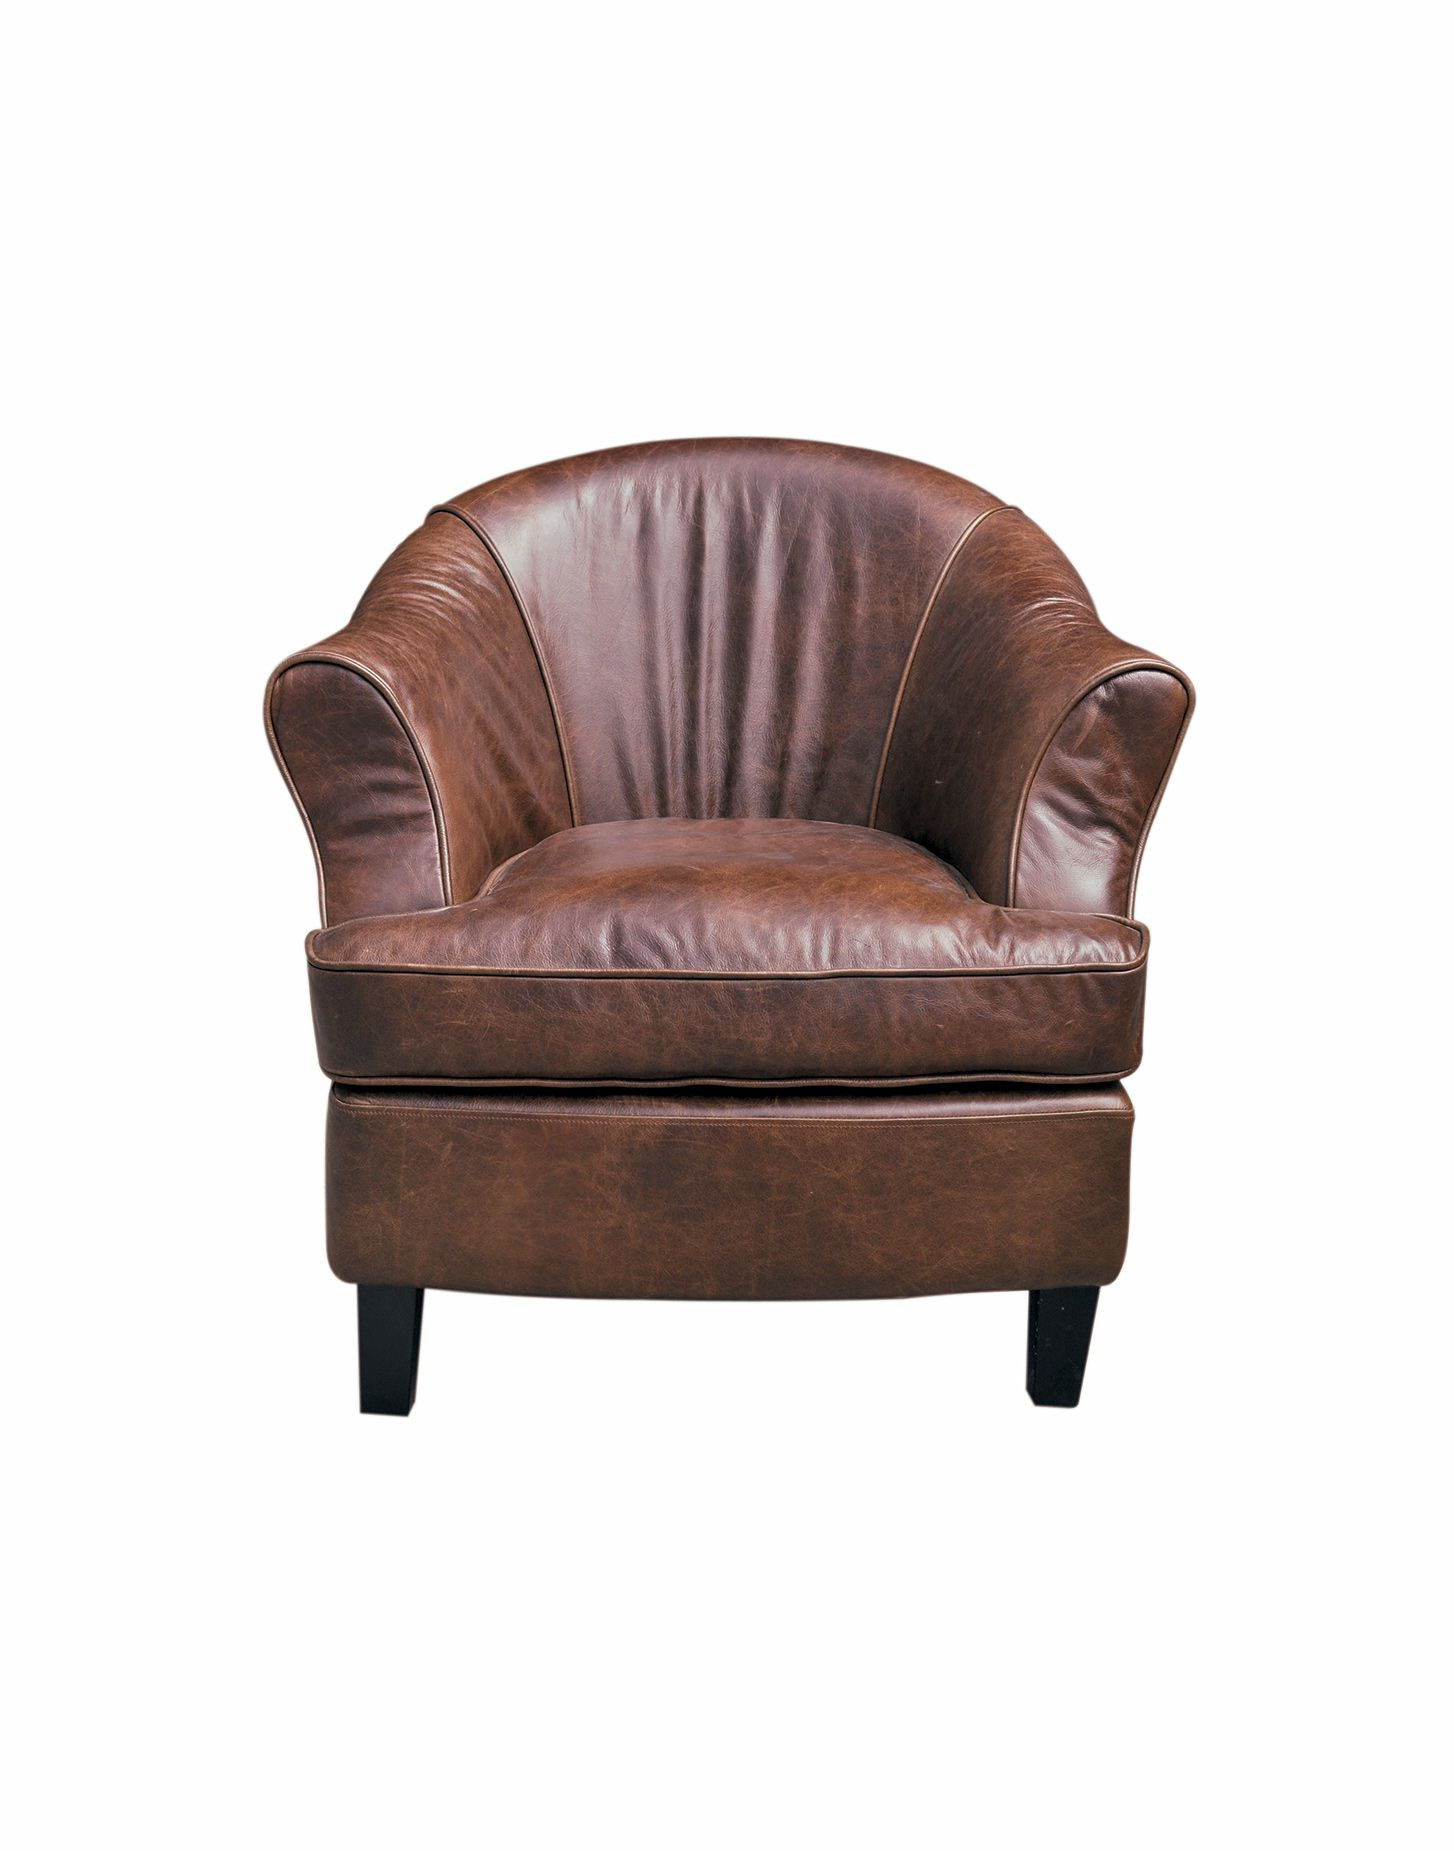 octopus sofa. Black Bedroom Furniture Sets. Home Design Ideas